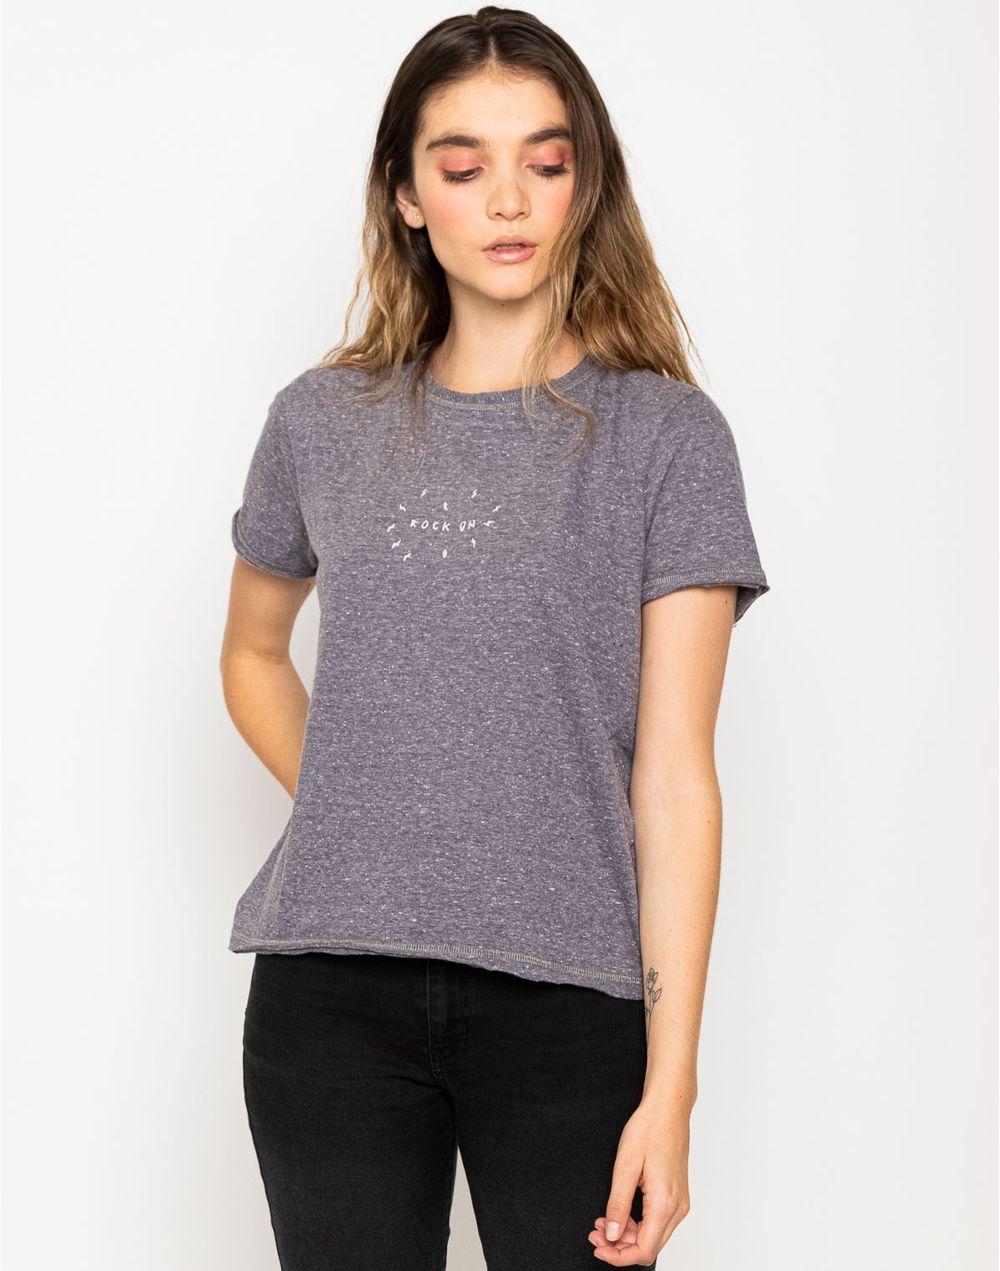 camiseta-180239-gris-1.jpg